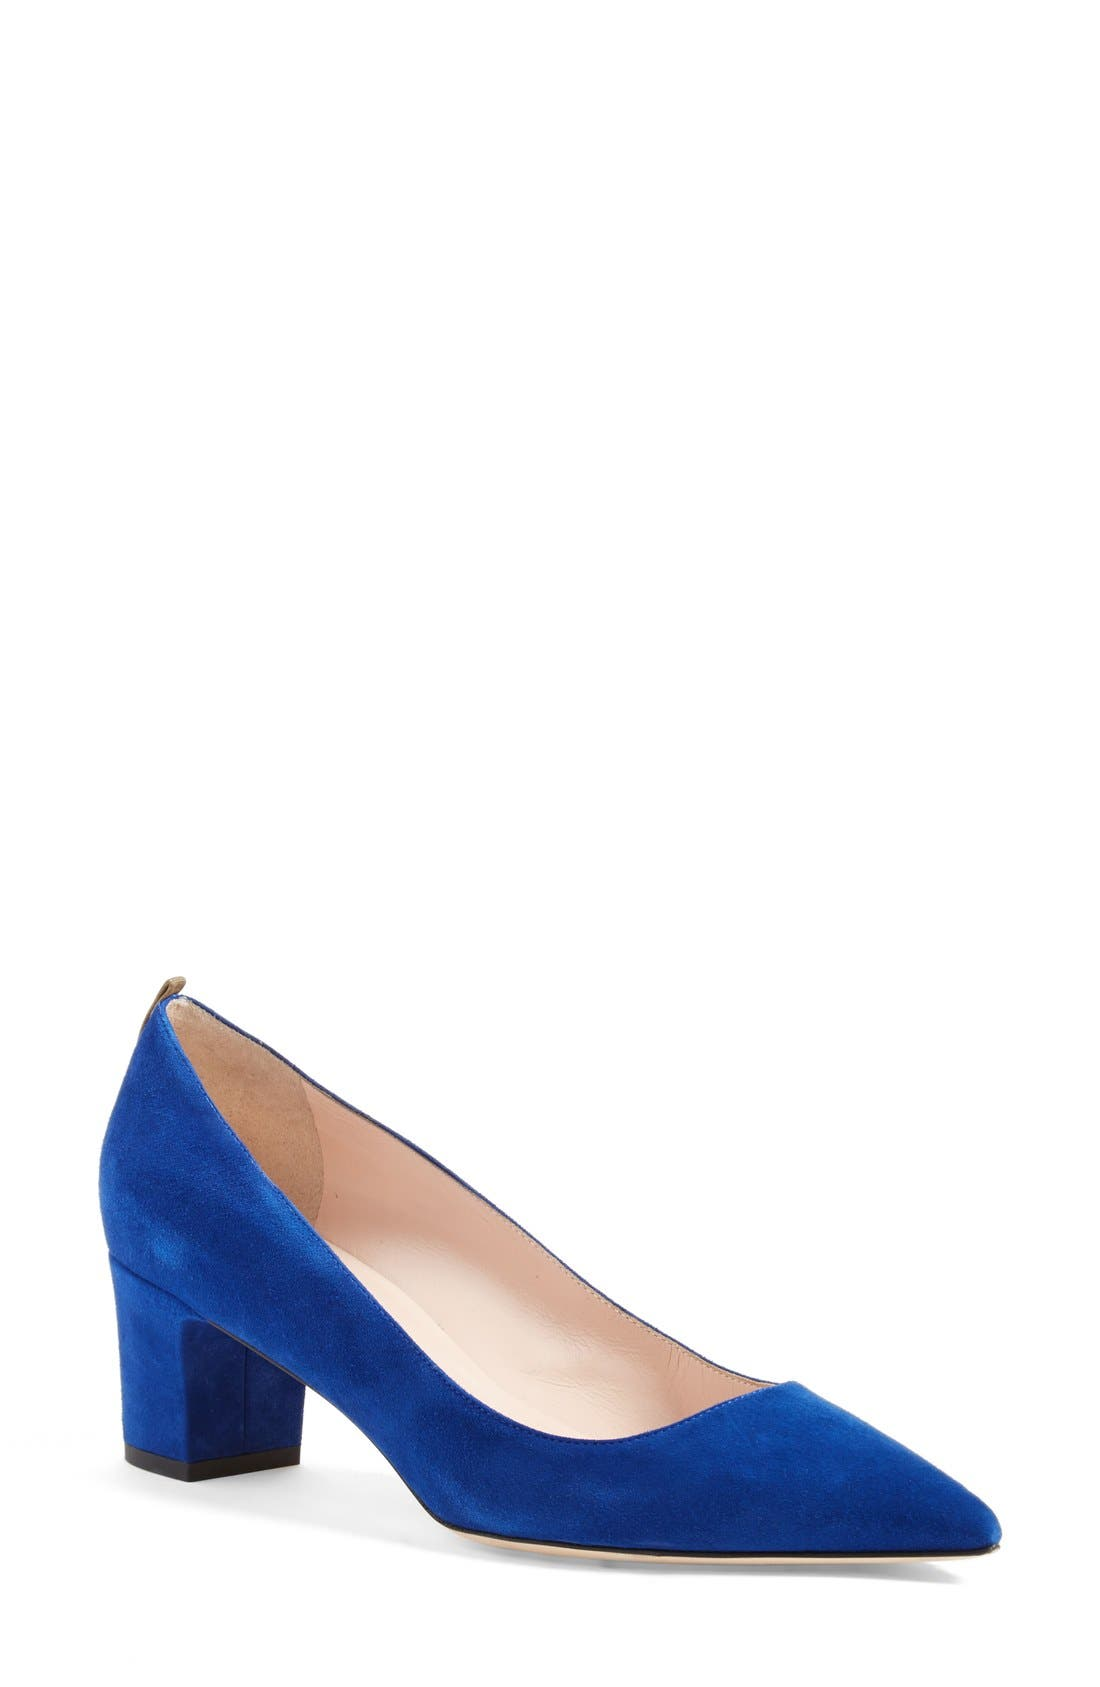 Alternate Image 1 Selected - SJP by Sarah Jessica Parker 'Katrina' Pointy Toe Block Heel Pump (Women)